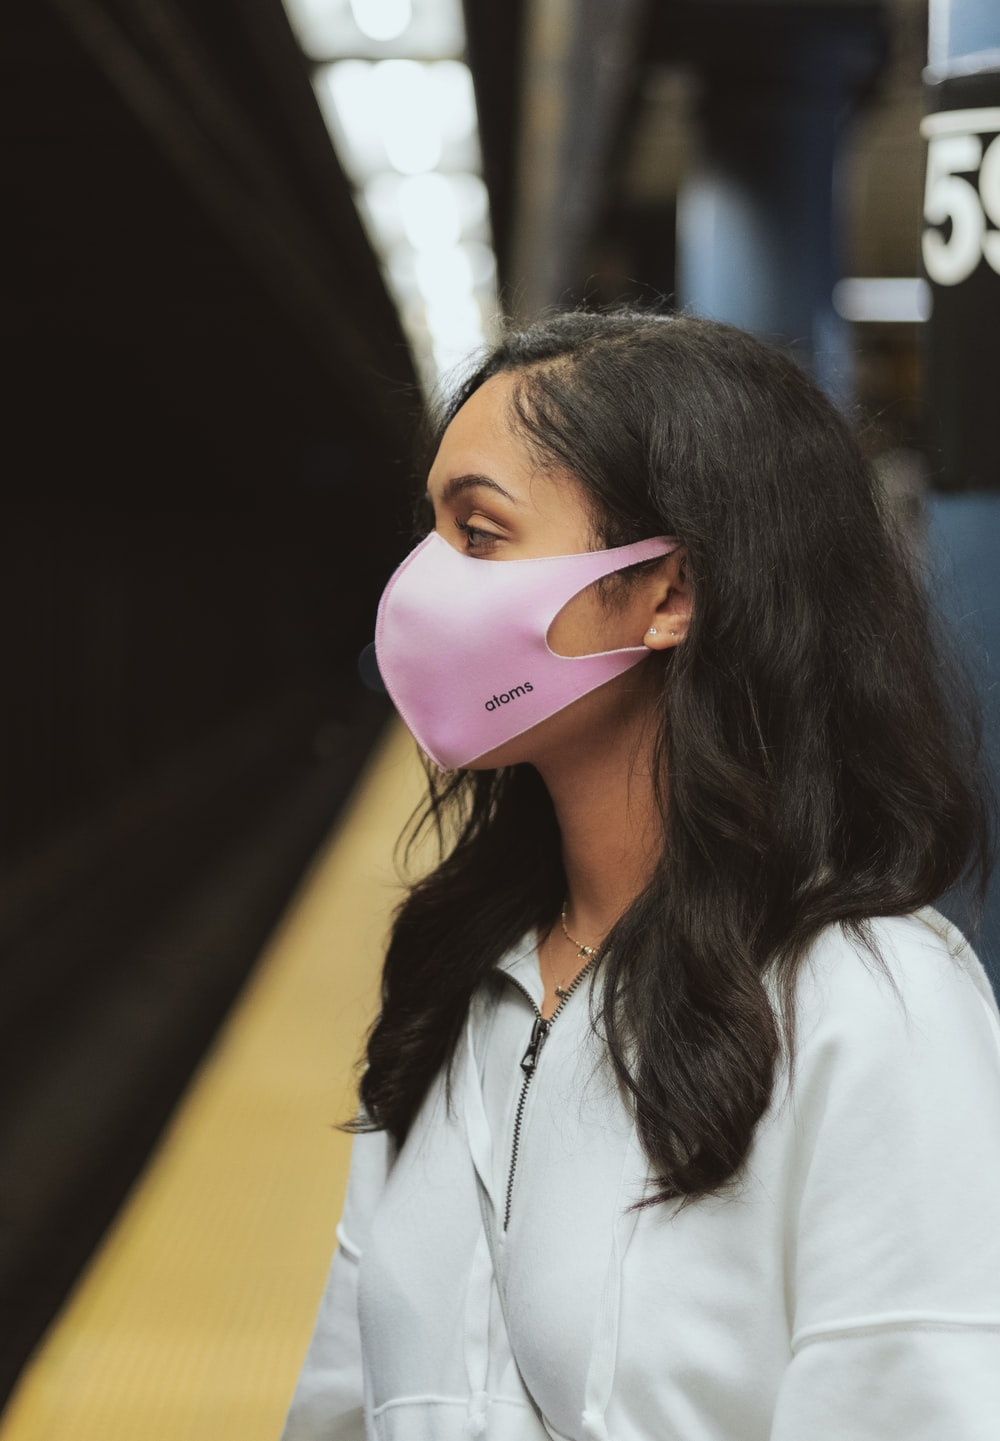 woman in white collared shirt wearing pink mask